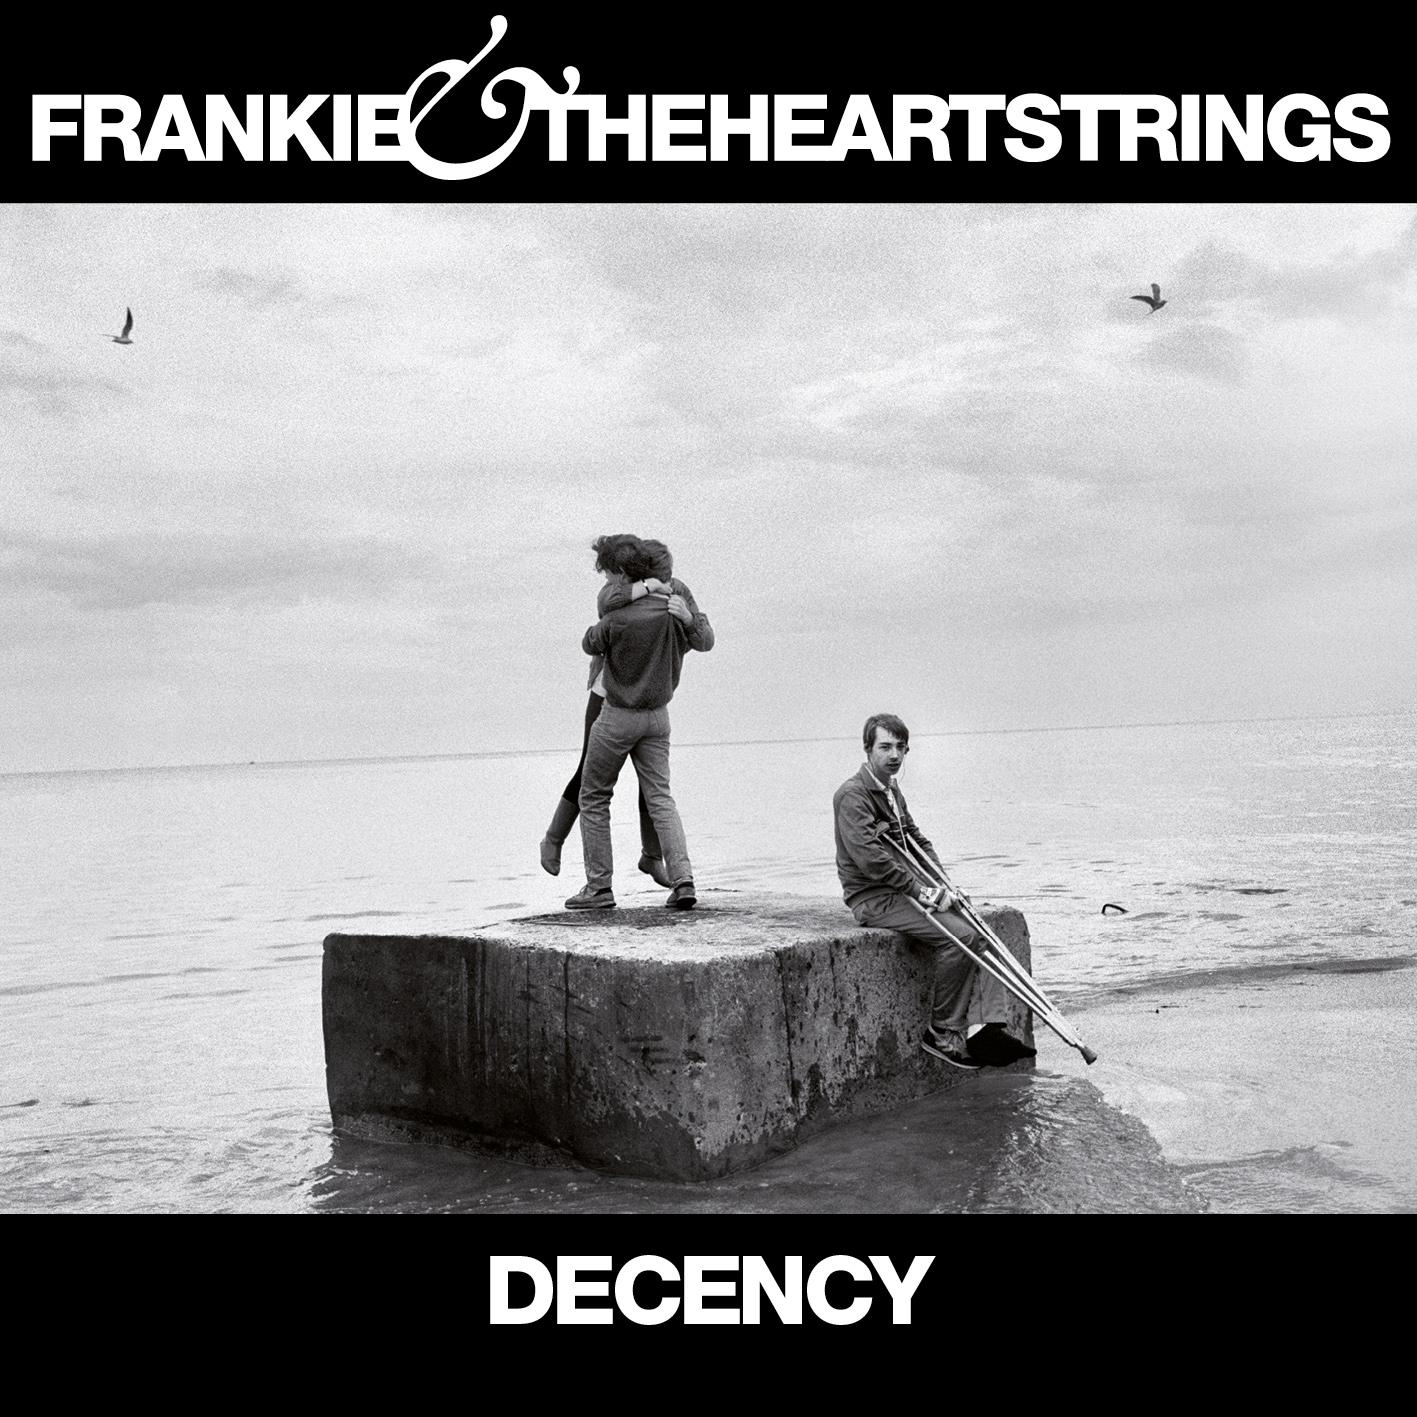 Decency CD - Frankie & The Heartstrings